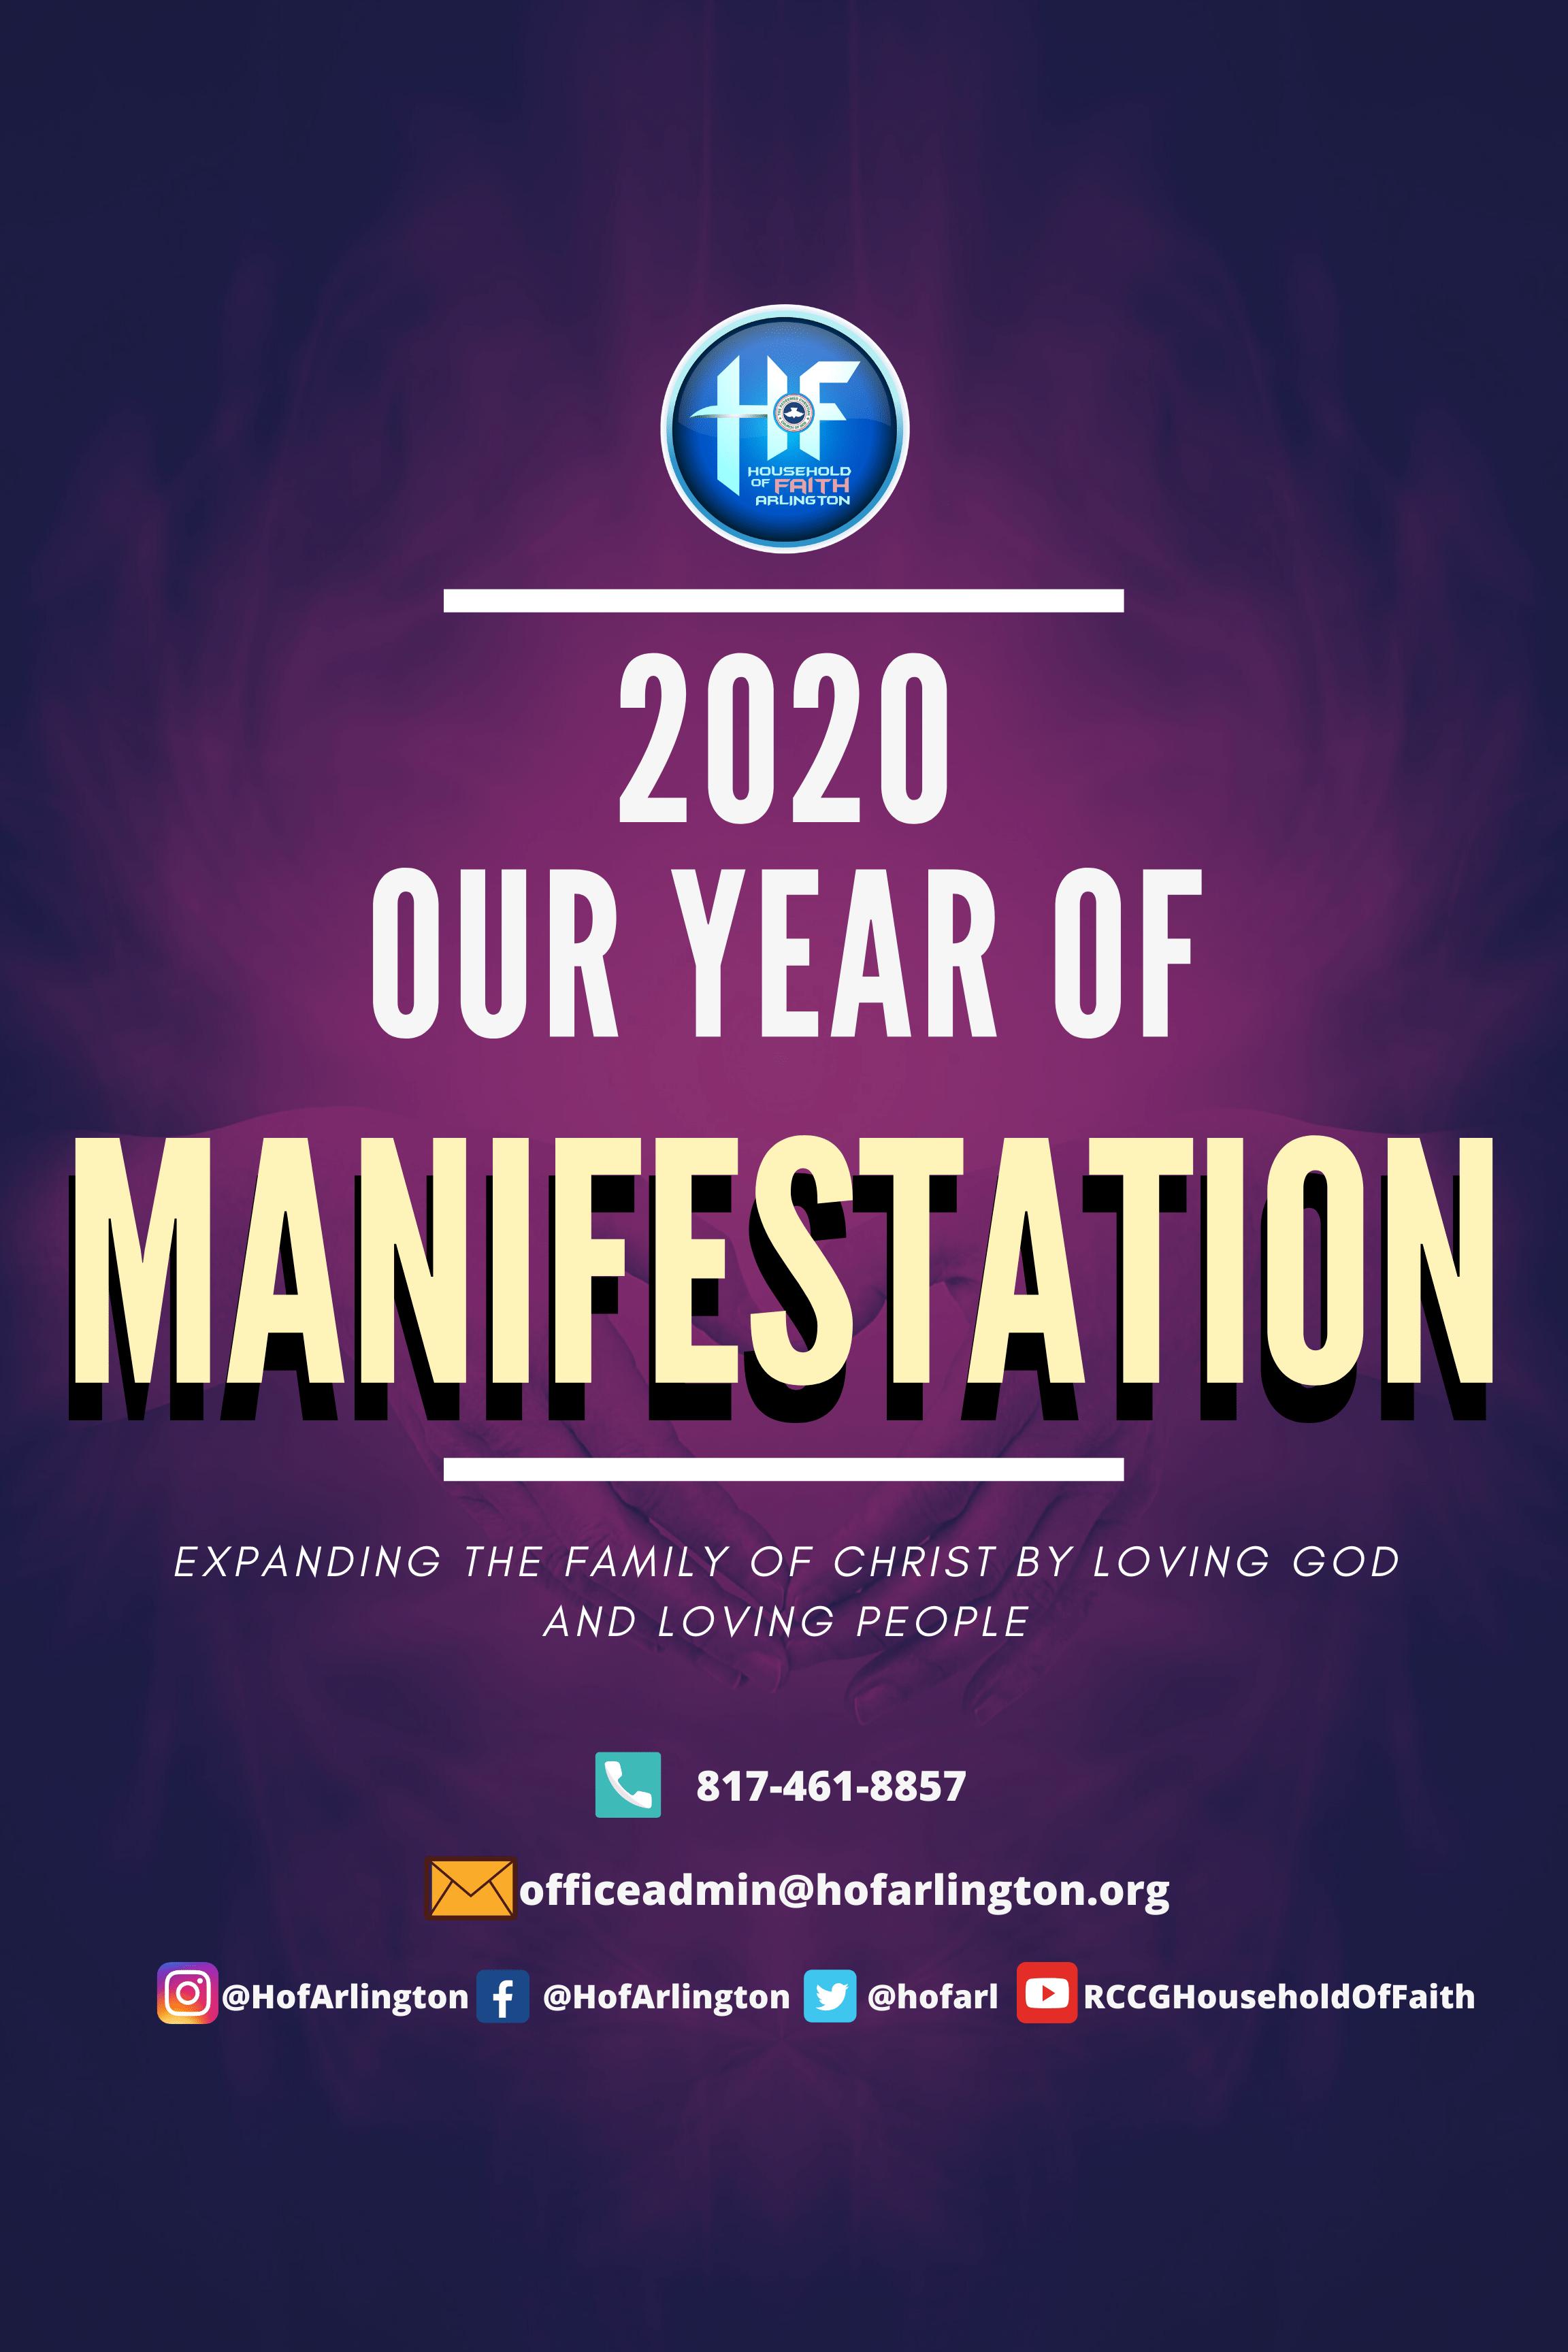 YEAR OF MANIFESTATION